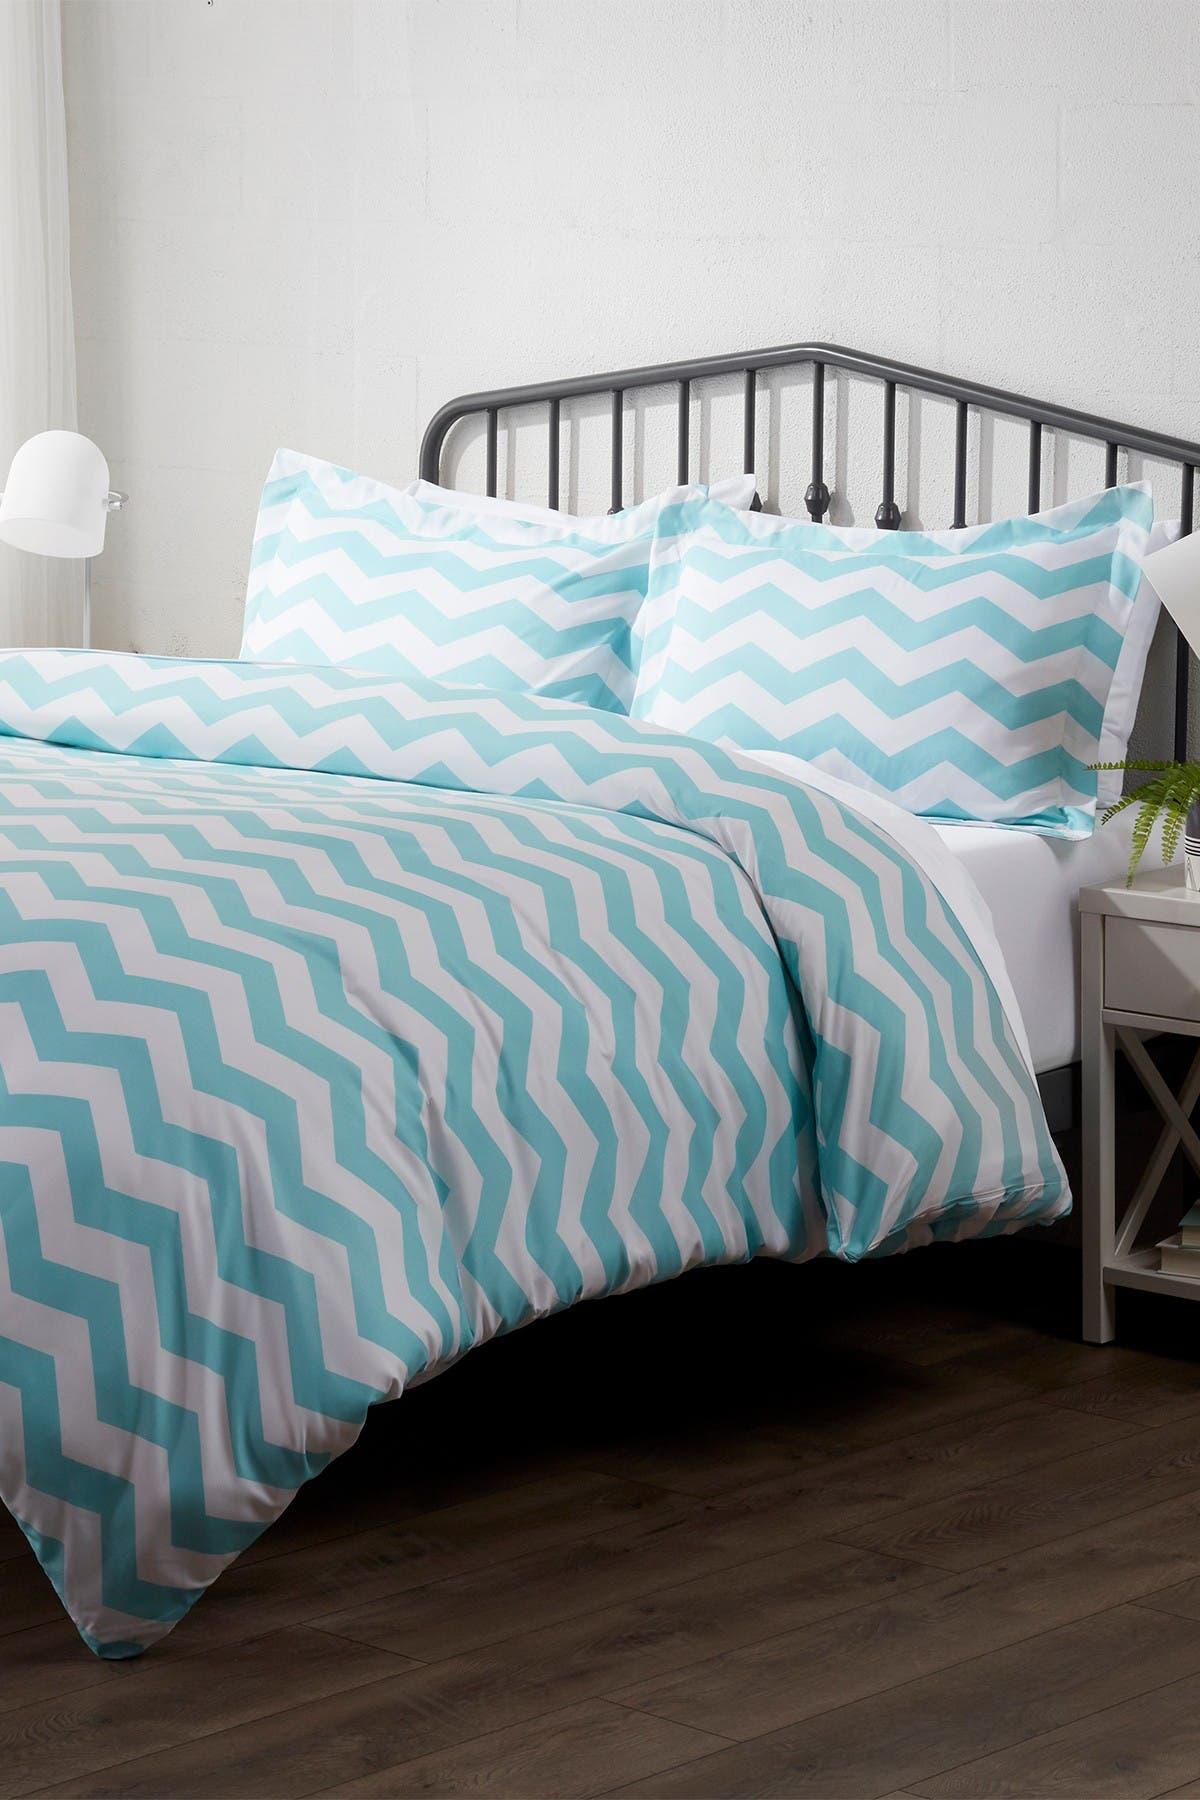 Ienjoy Home Home Spun Premium Ultra Soft Arrow Pattern 2-piece Twin Duvet Cover Set In Turquoise